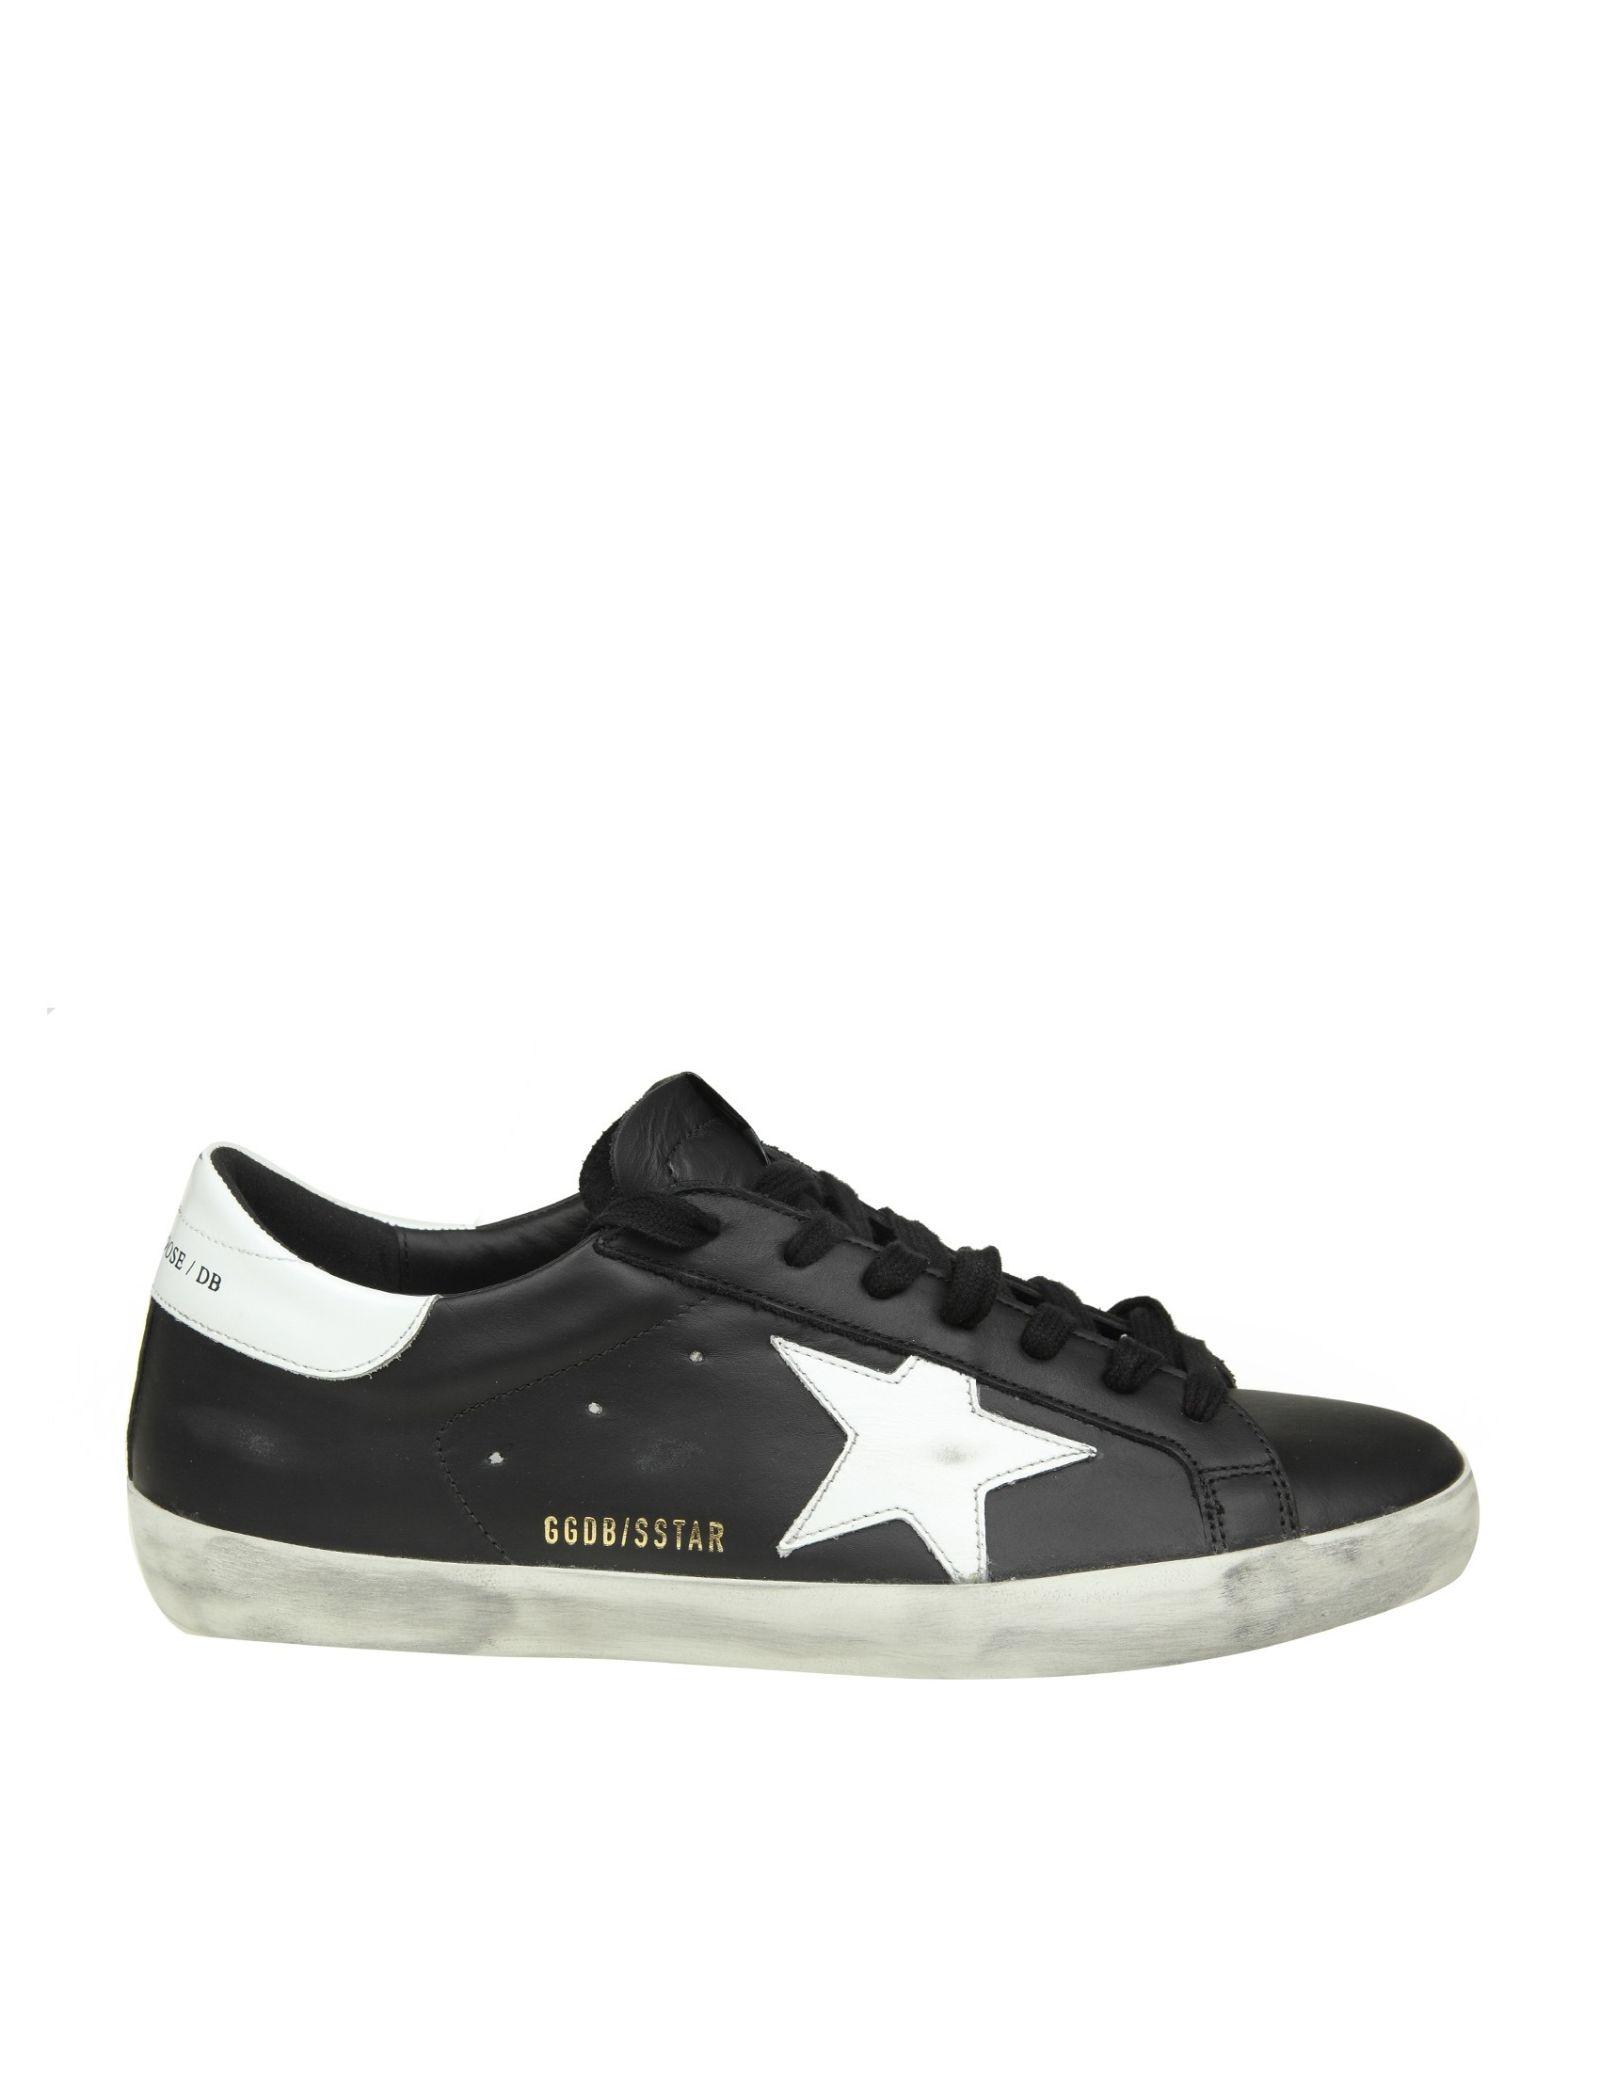 453bc92c86ea0 Golden Goose Superstar Sneakers In Black Leather - Black ...